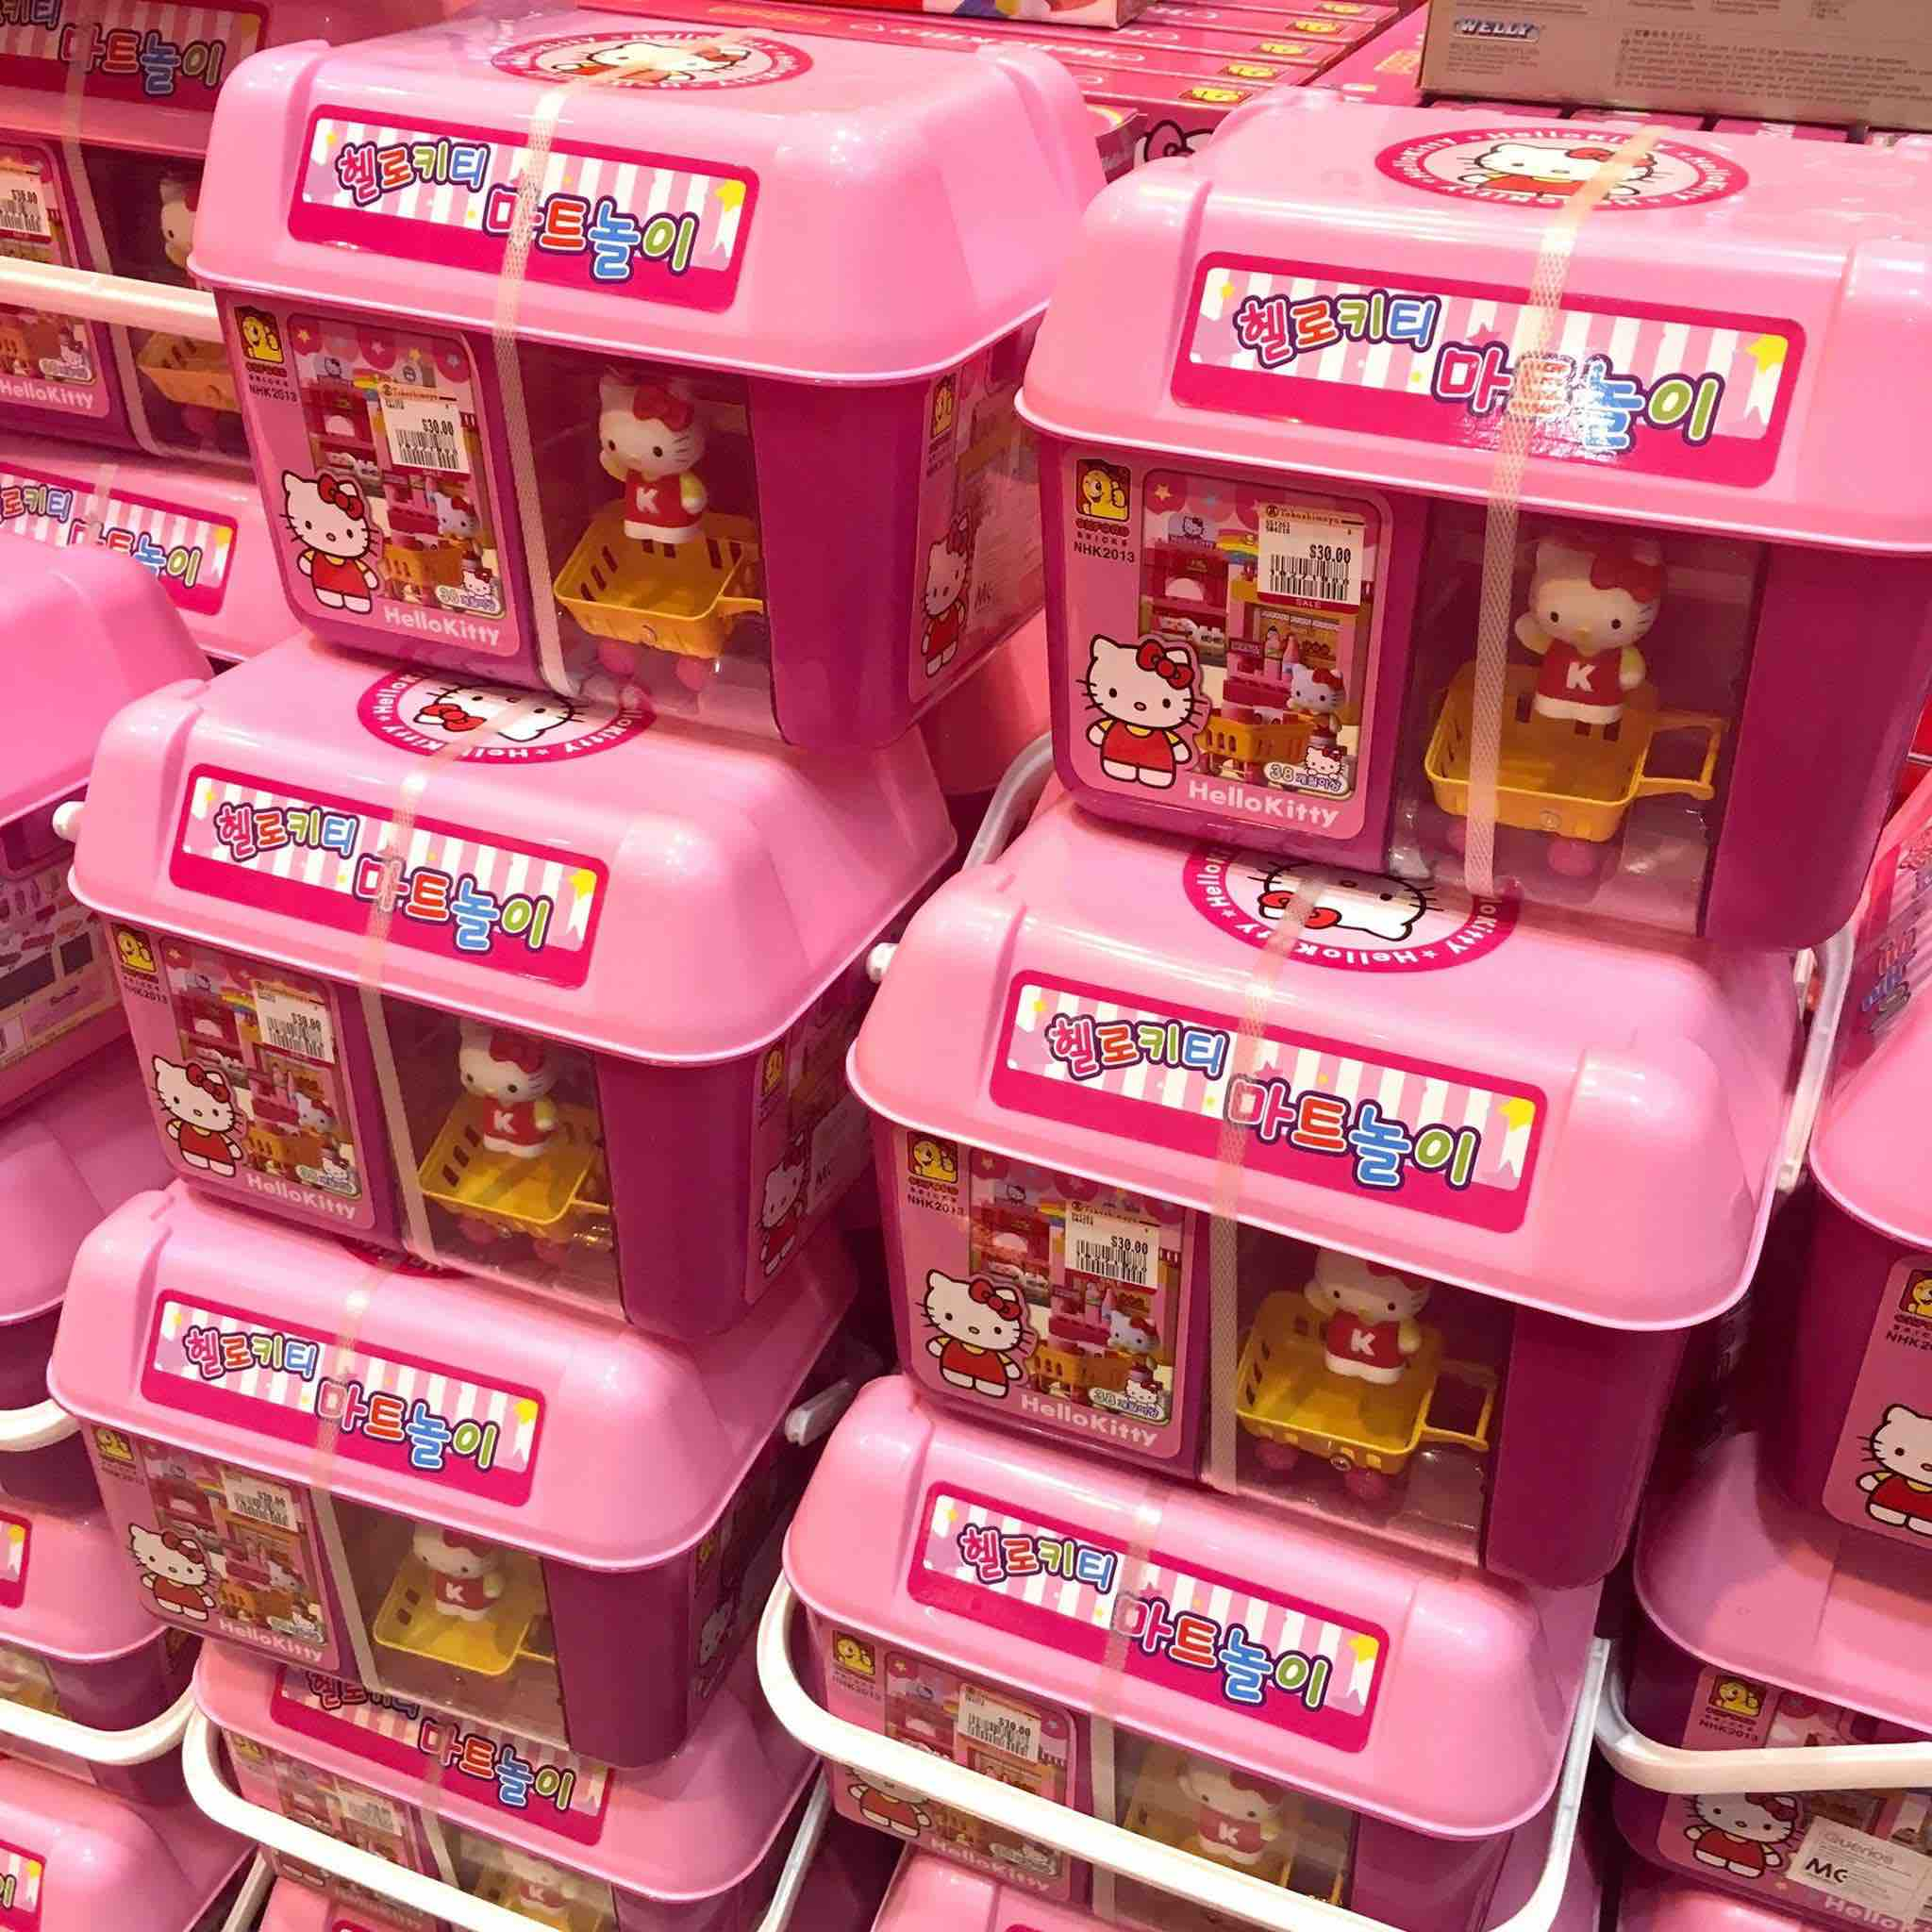 Takashimaya Singapore 21st Craziest Toys Sale Promotion 28 Jul - 6 Aug 2017   Why Not Deals 5 & Promotions